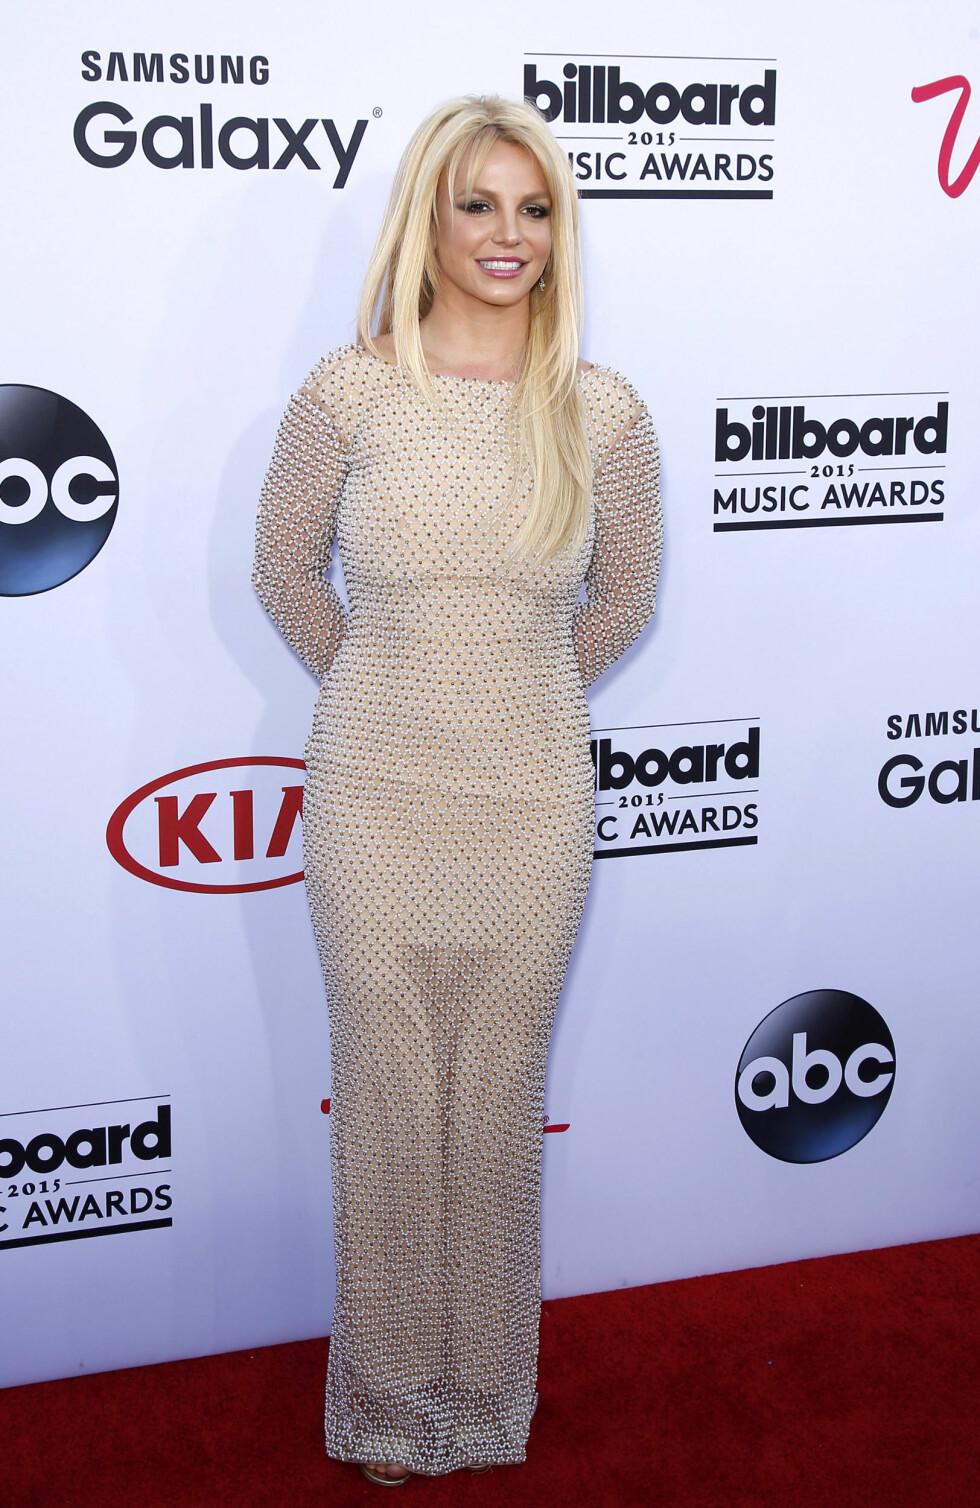 BEIGE MED BLING: Britney Spears på den røde løperen. Foto: wenn.com Scanpix